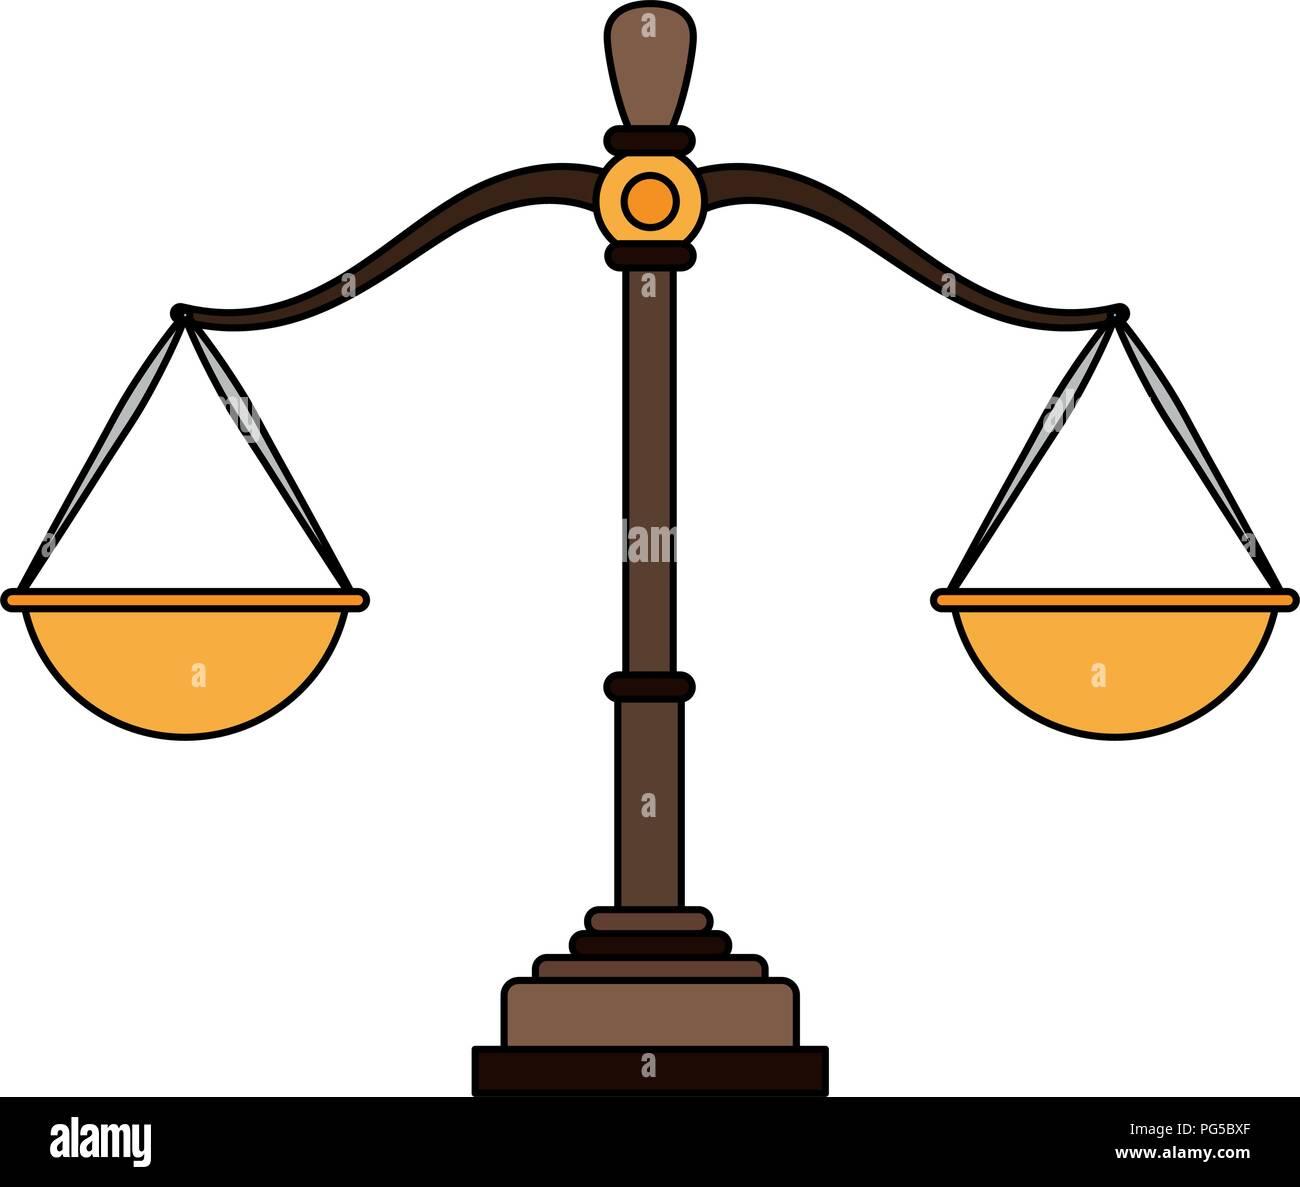 Justice balance symbol - Stock Vector